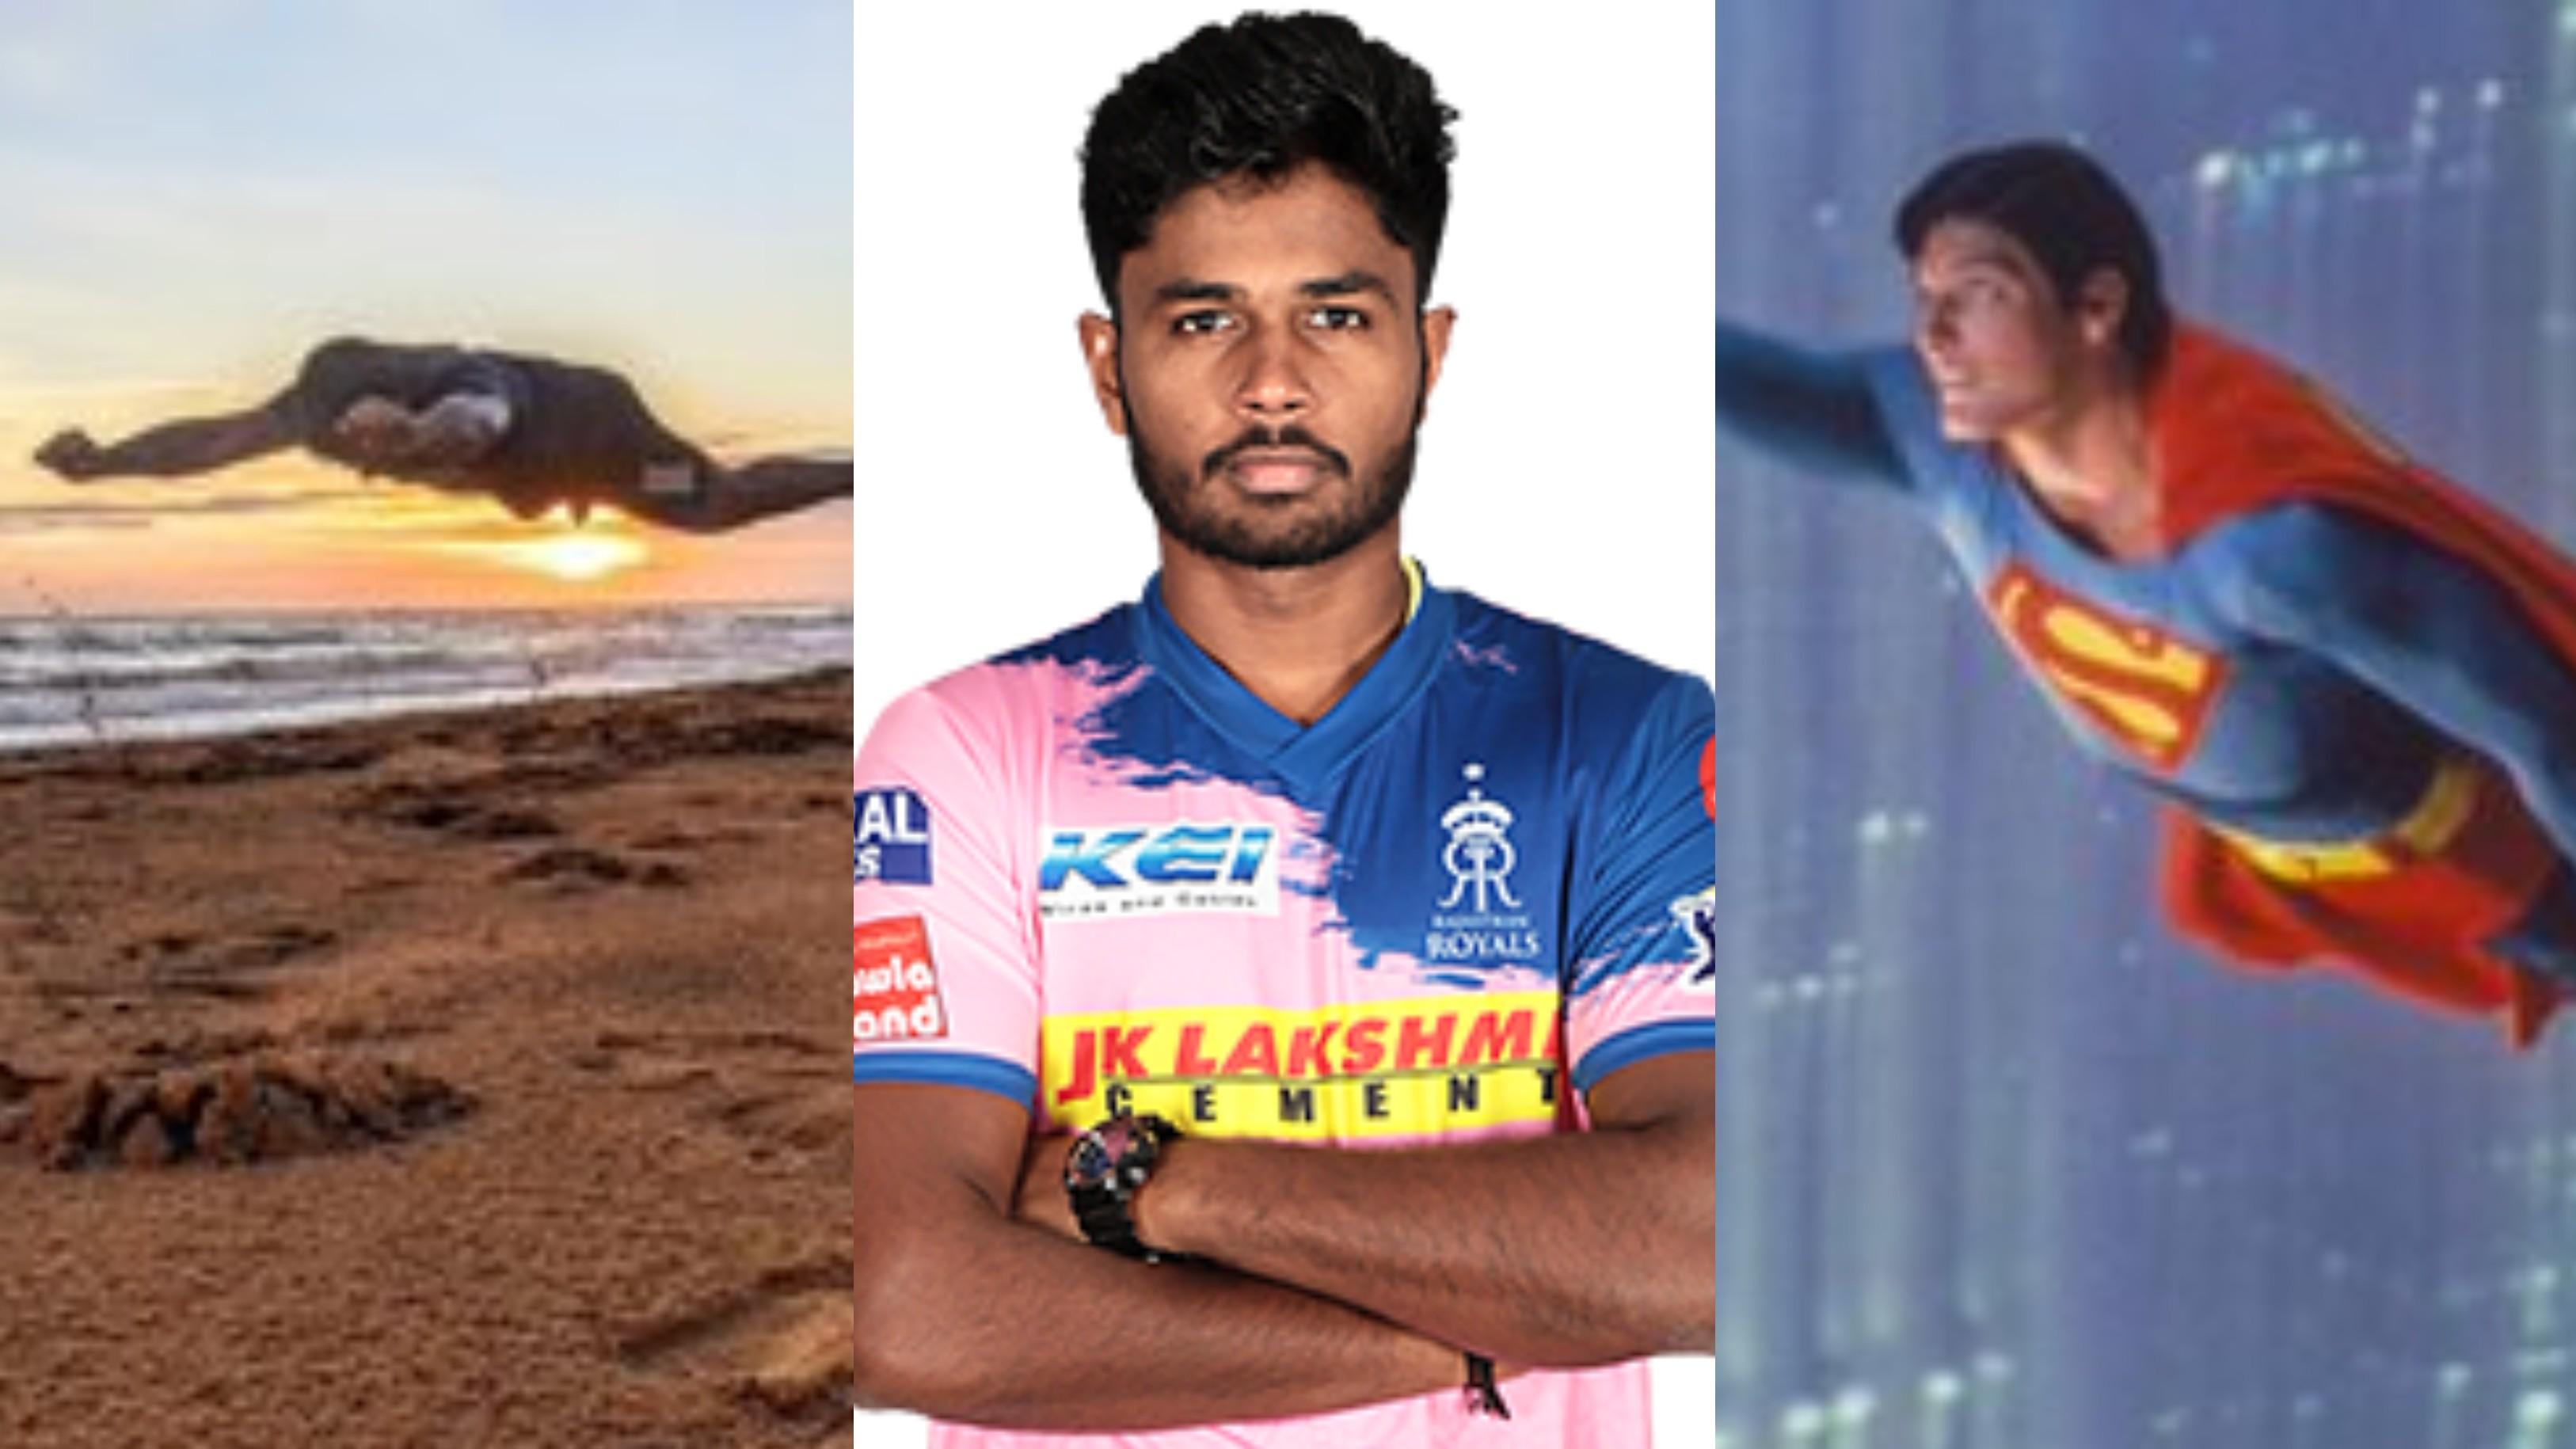 Rajasthan Royals compare Sanju Samson to